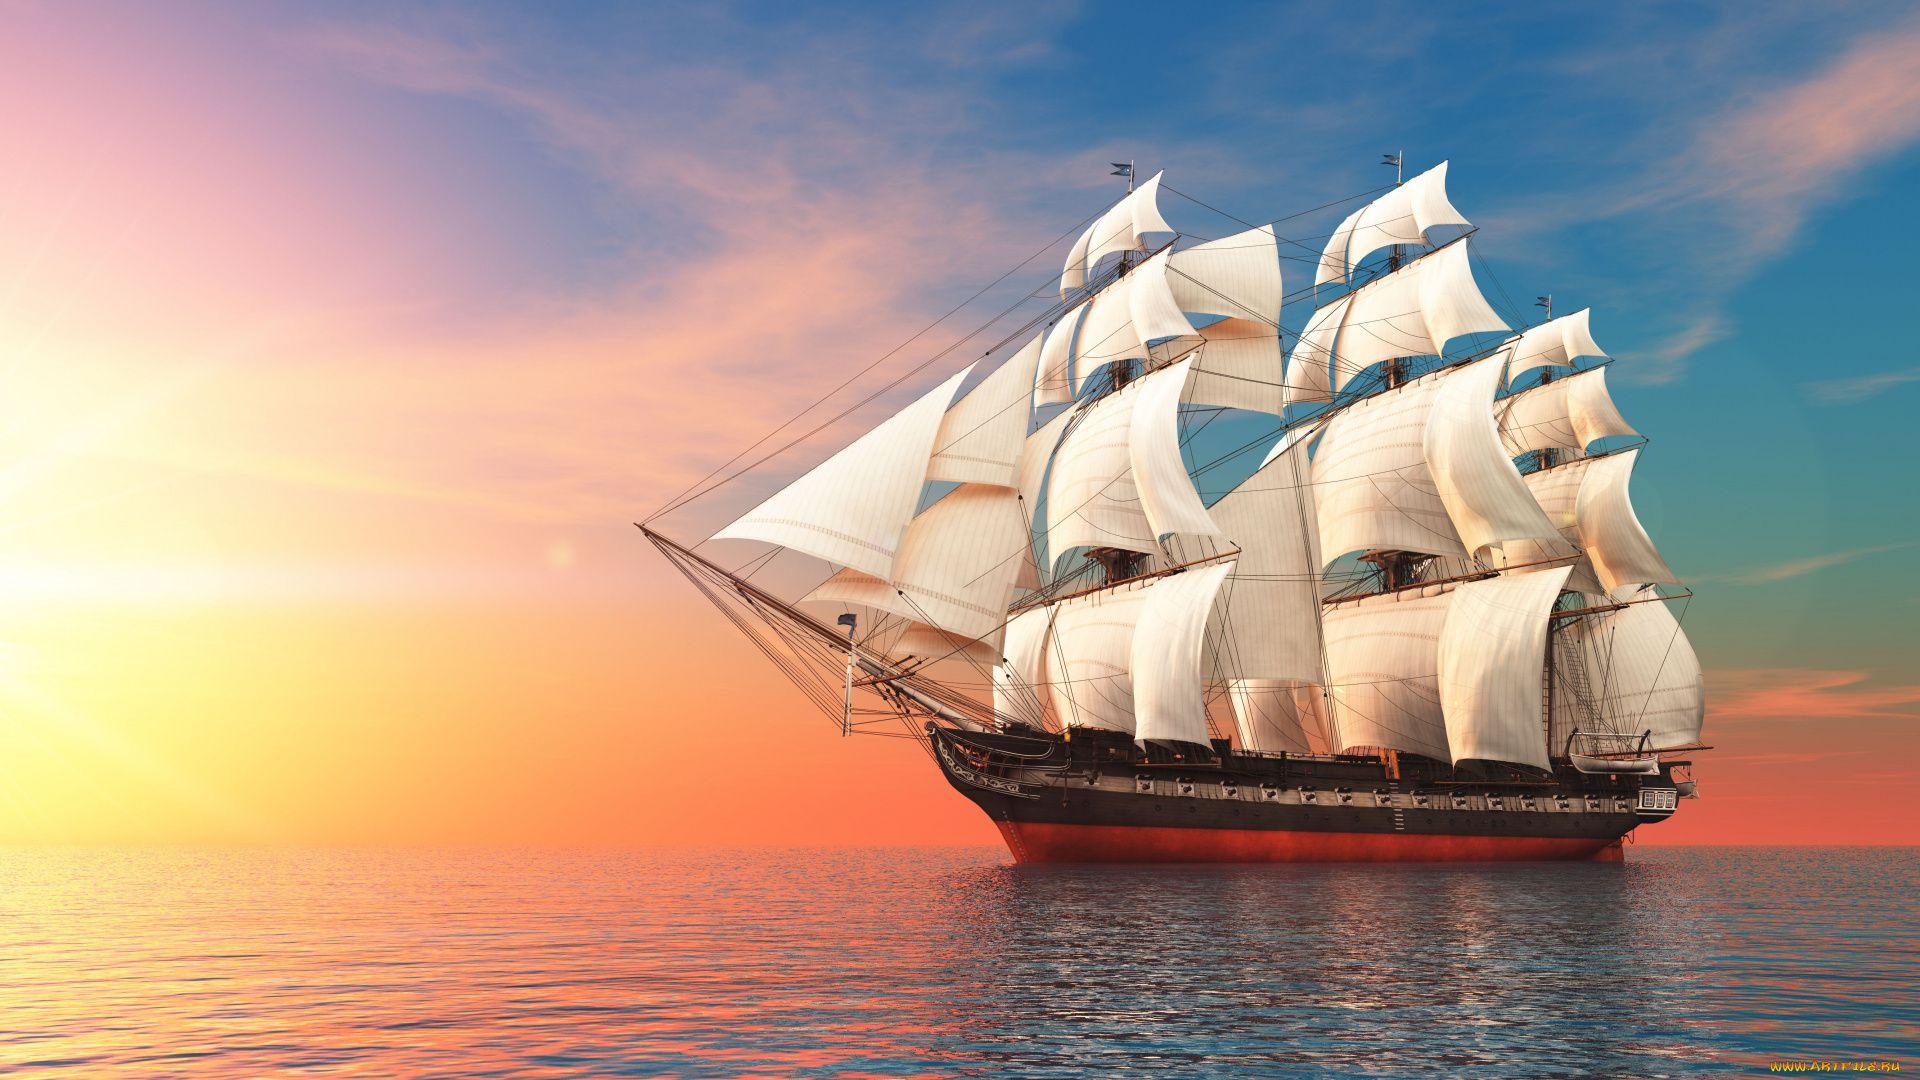 Ship HD Wallpaper